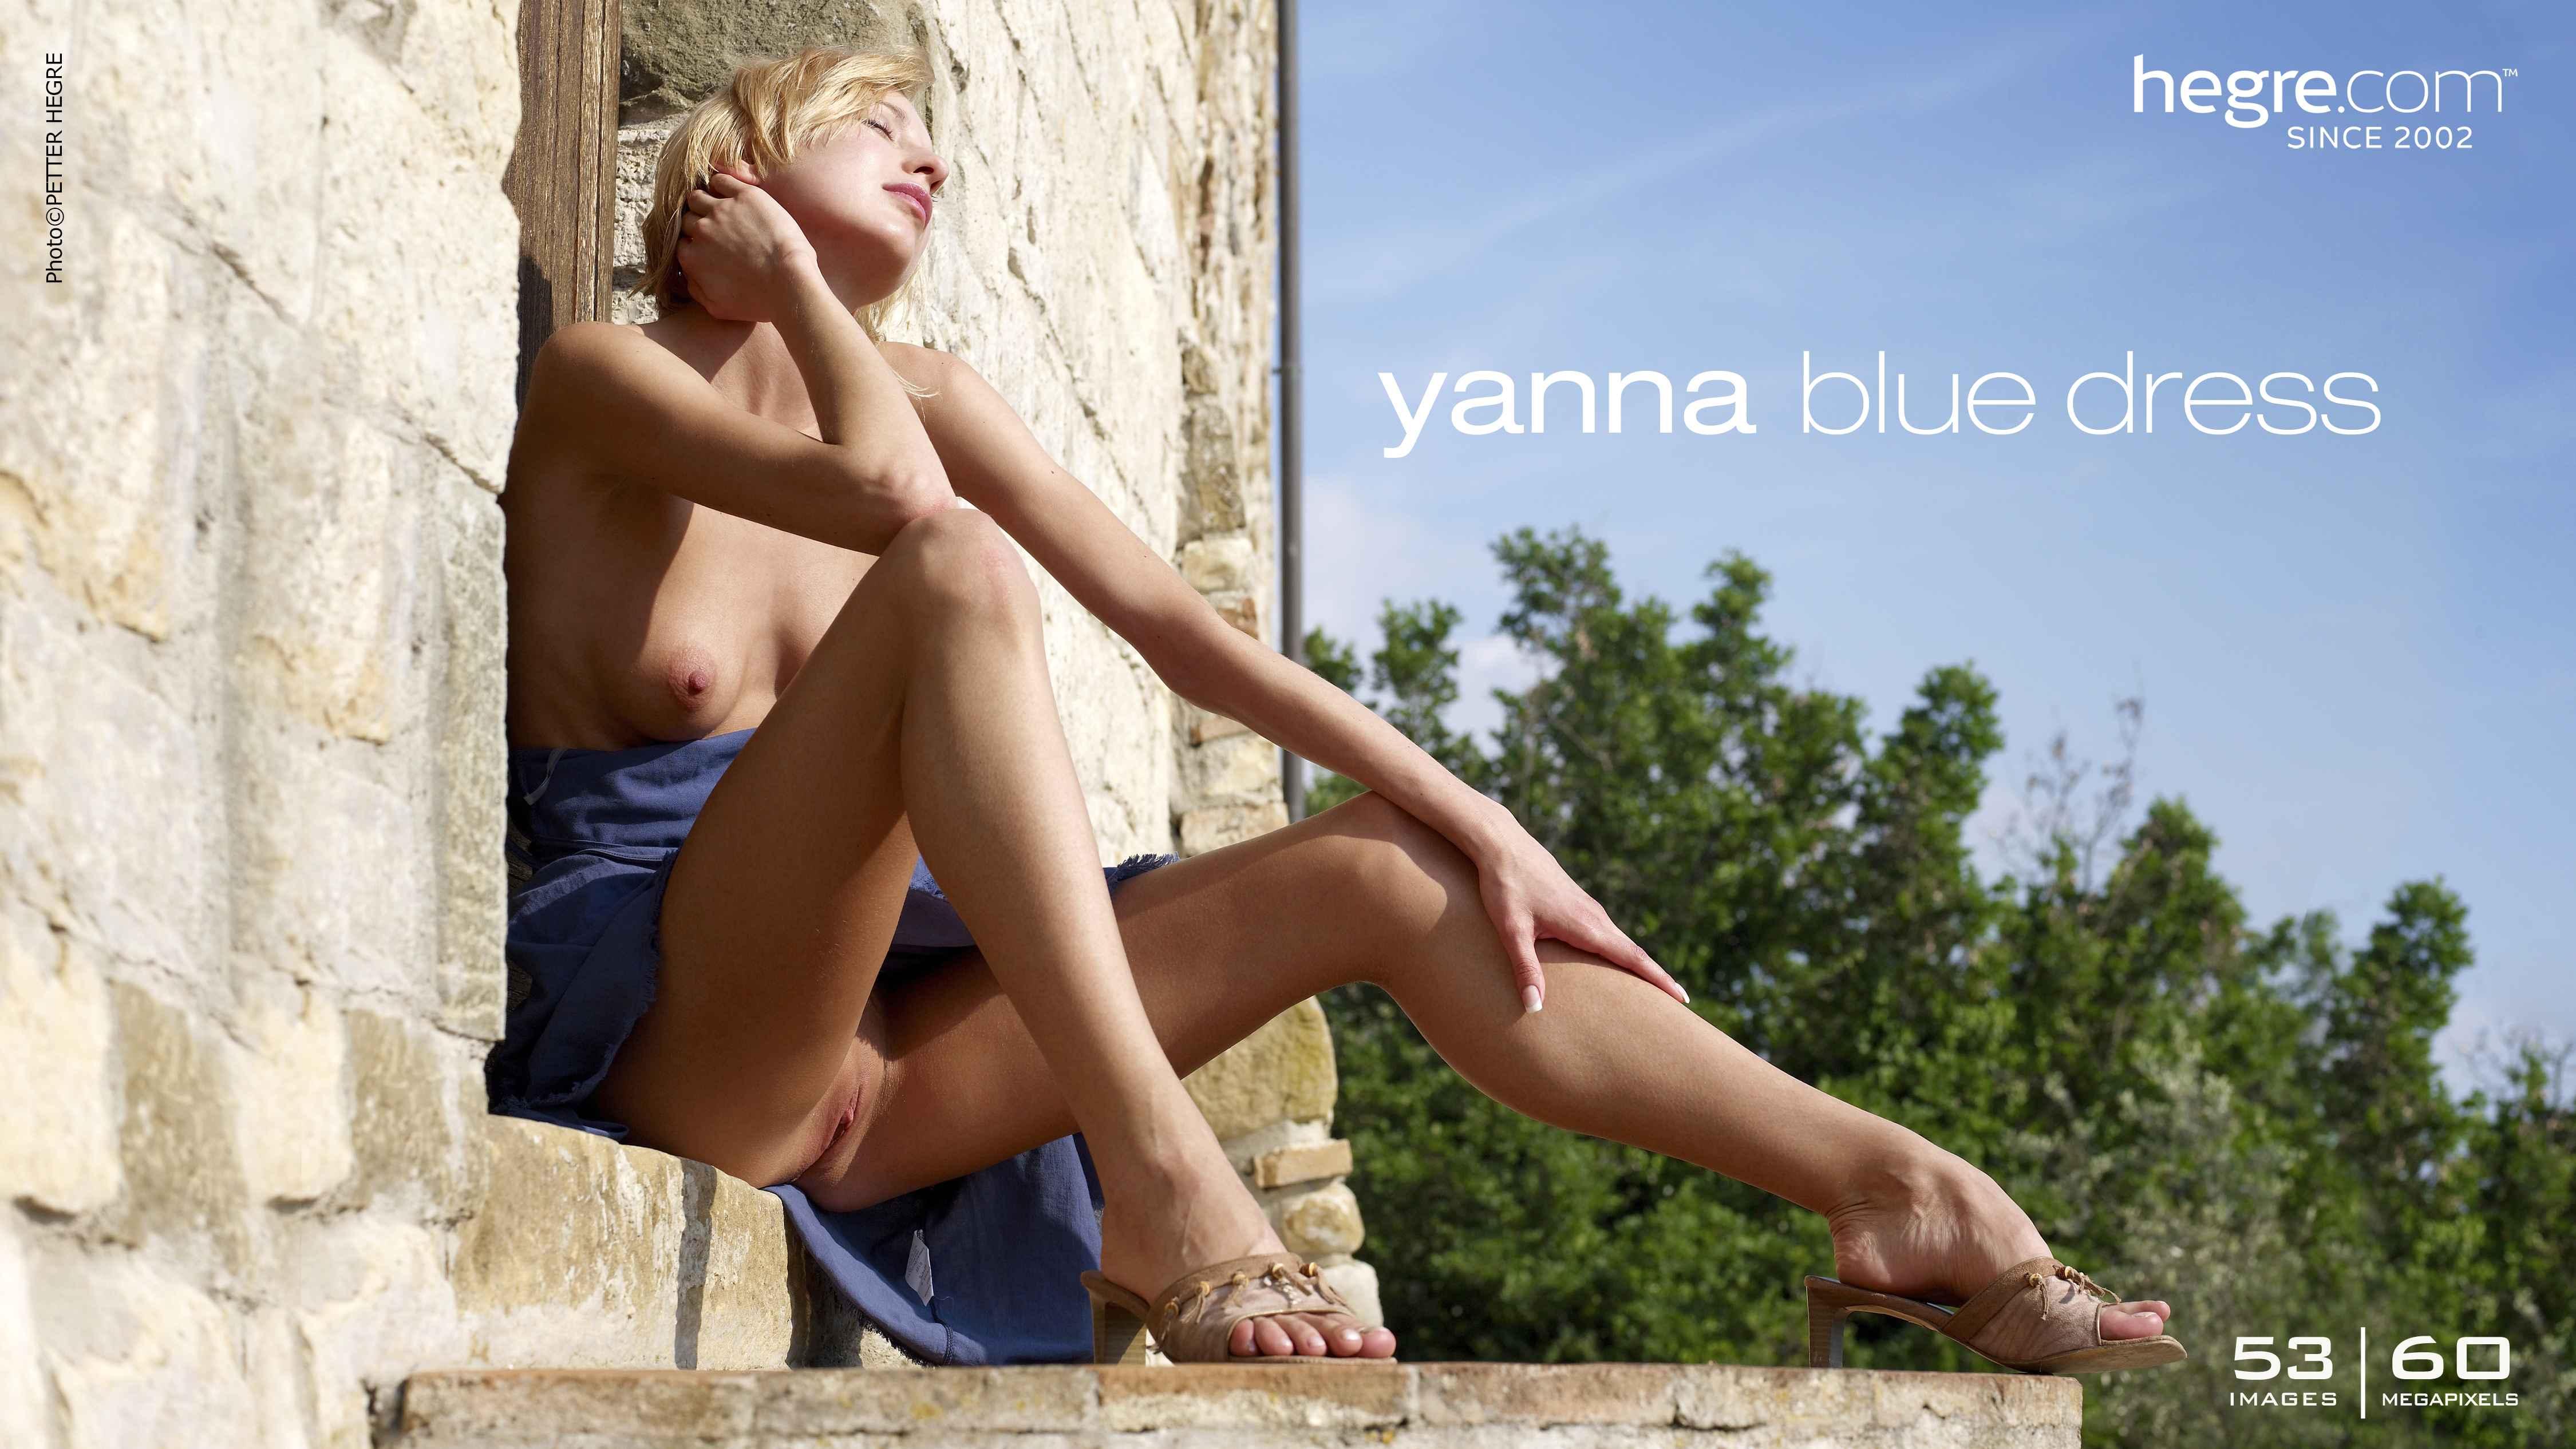 Yanna vestido azul